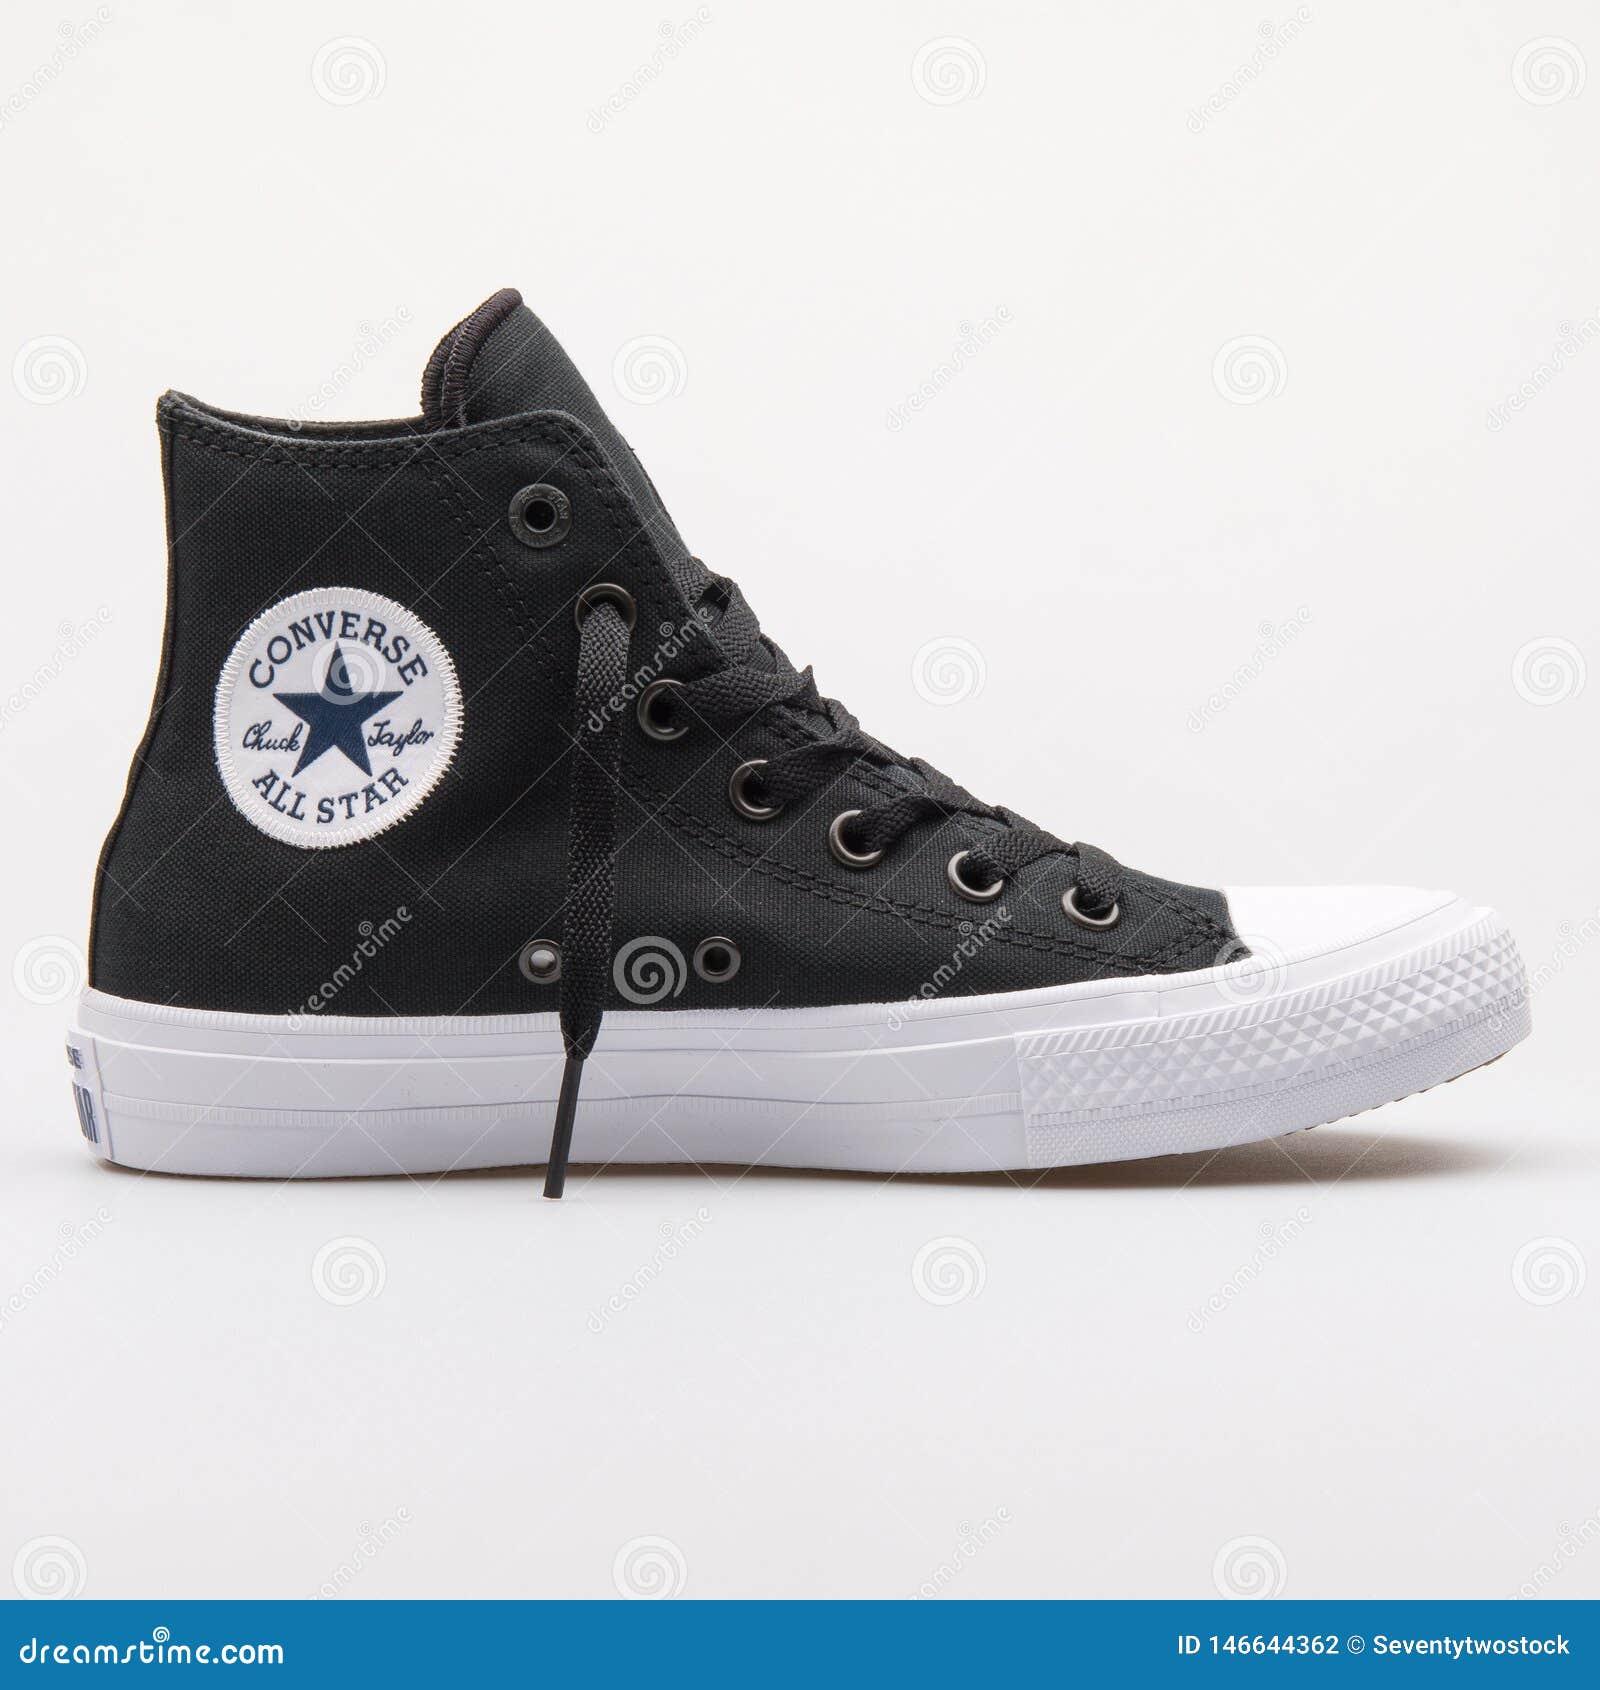 converse all star 2 black